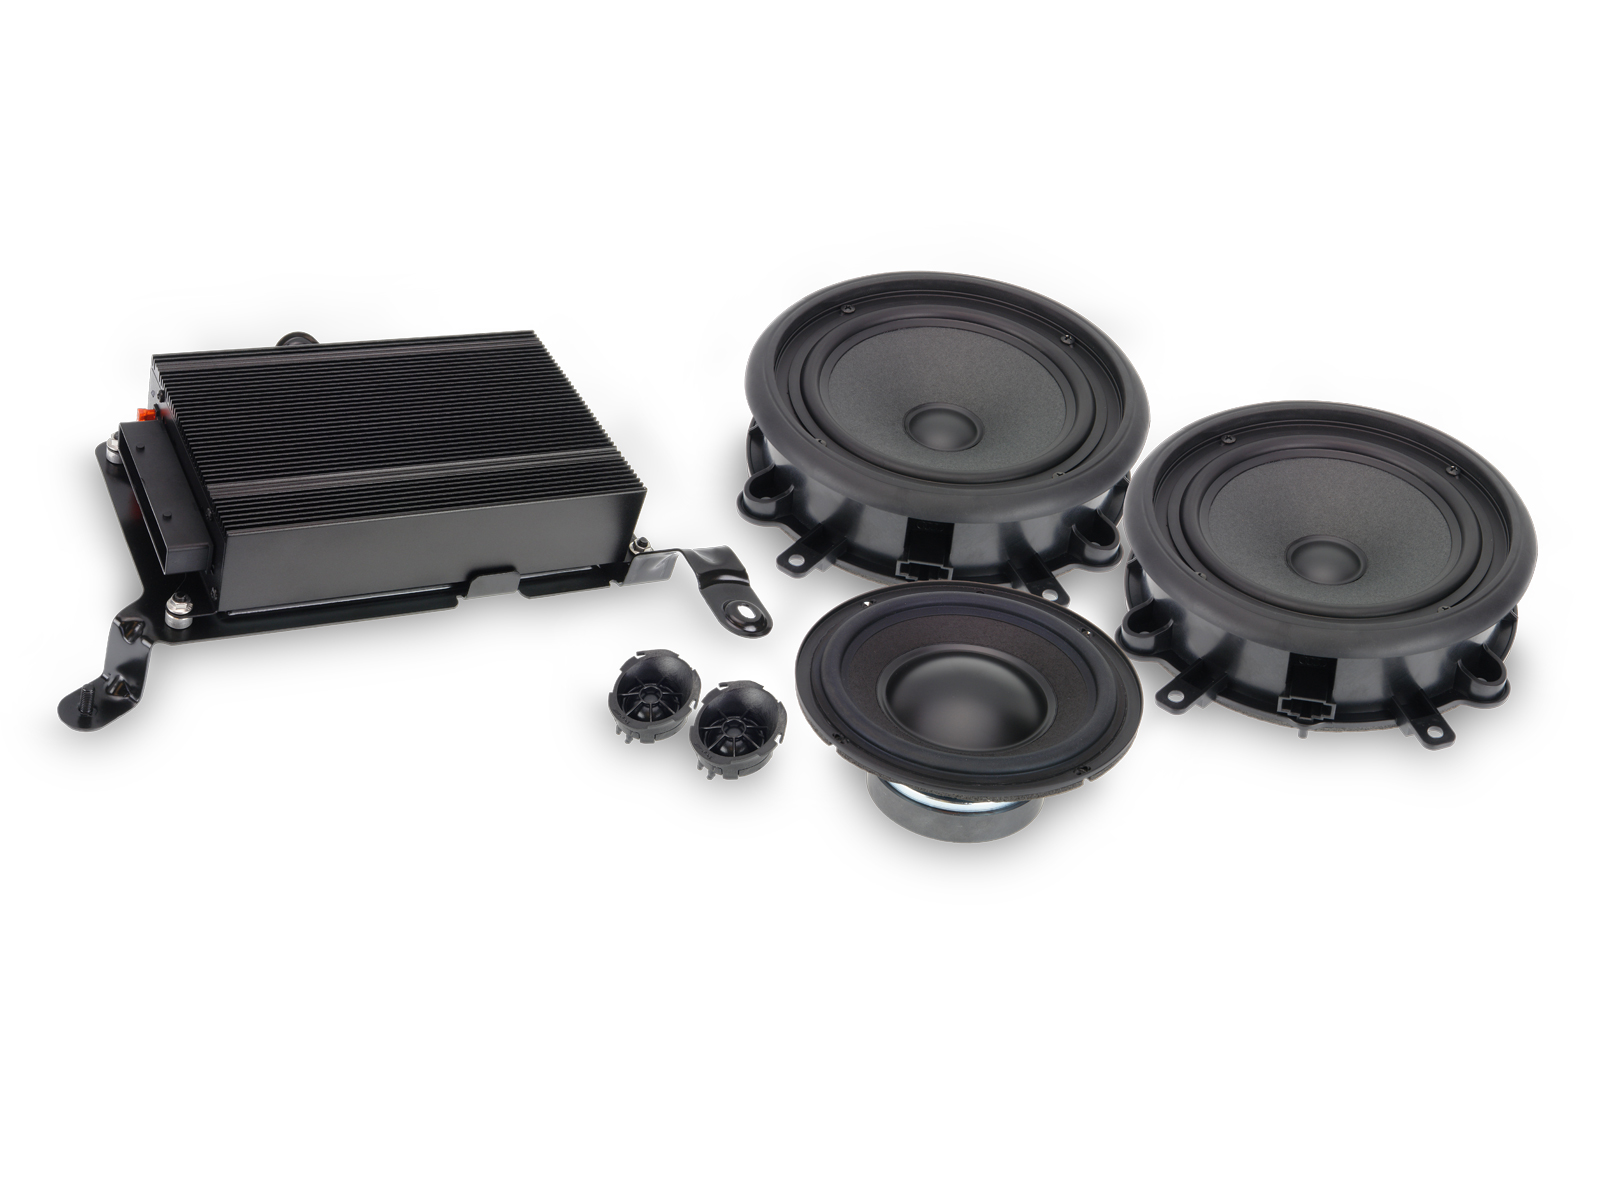 Alpine SPC-300A3 Premium Austausch-Lautsprechersystem für Audi A3 (8P/8PA)